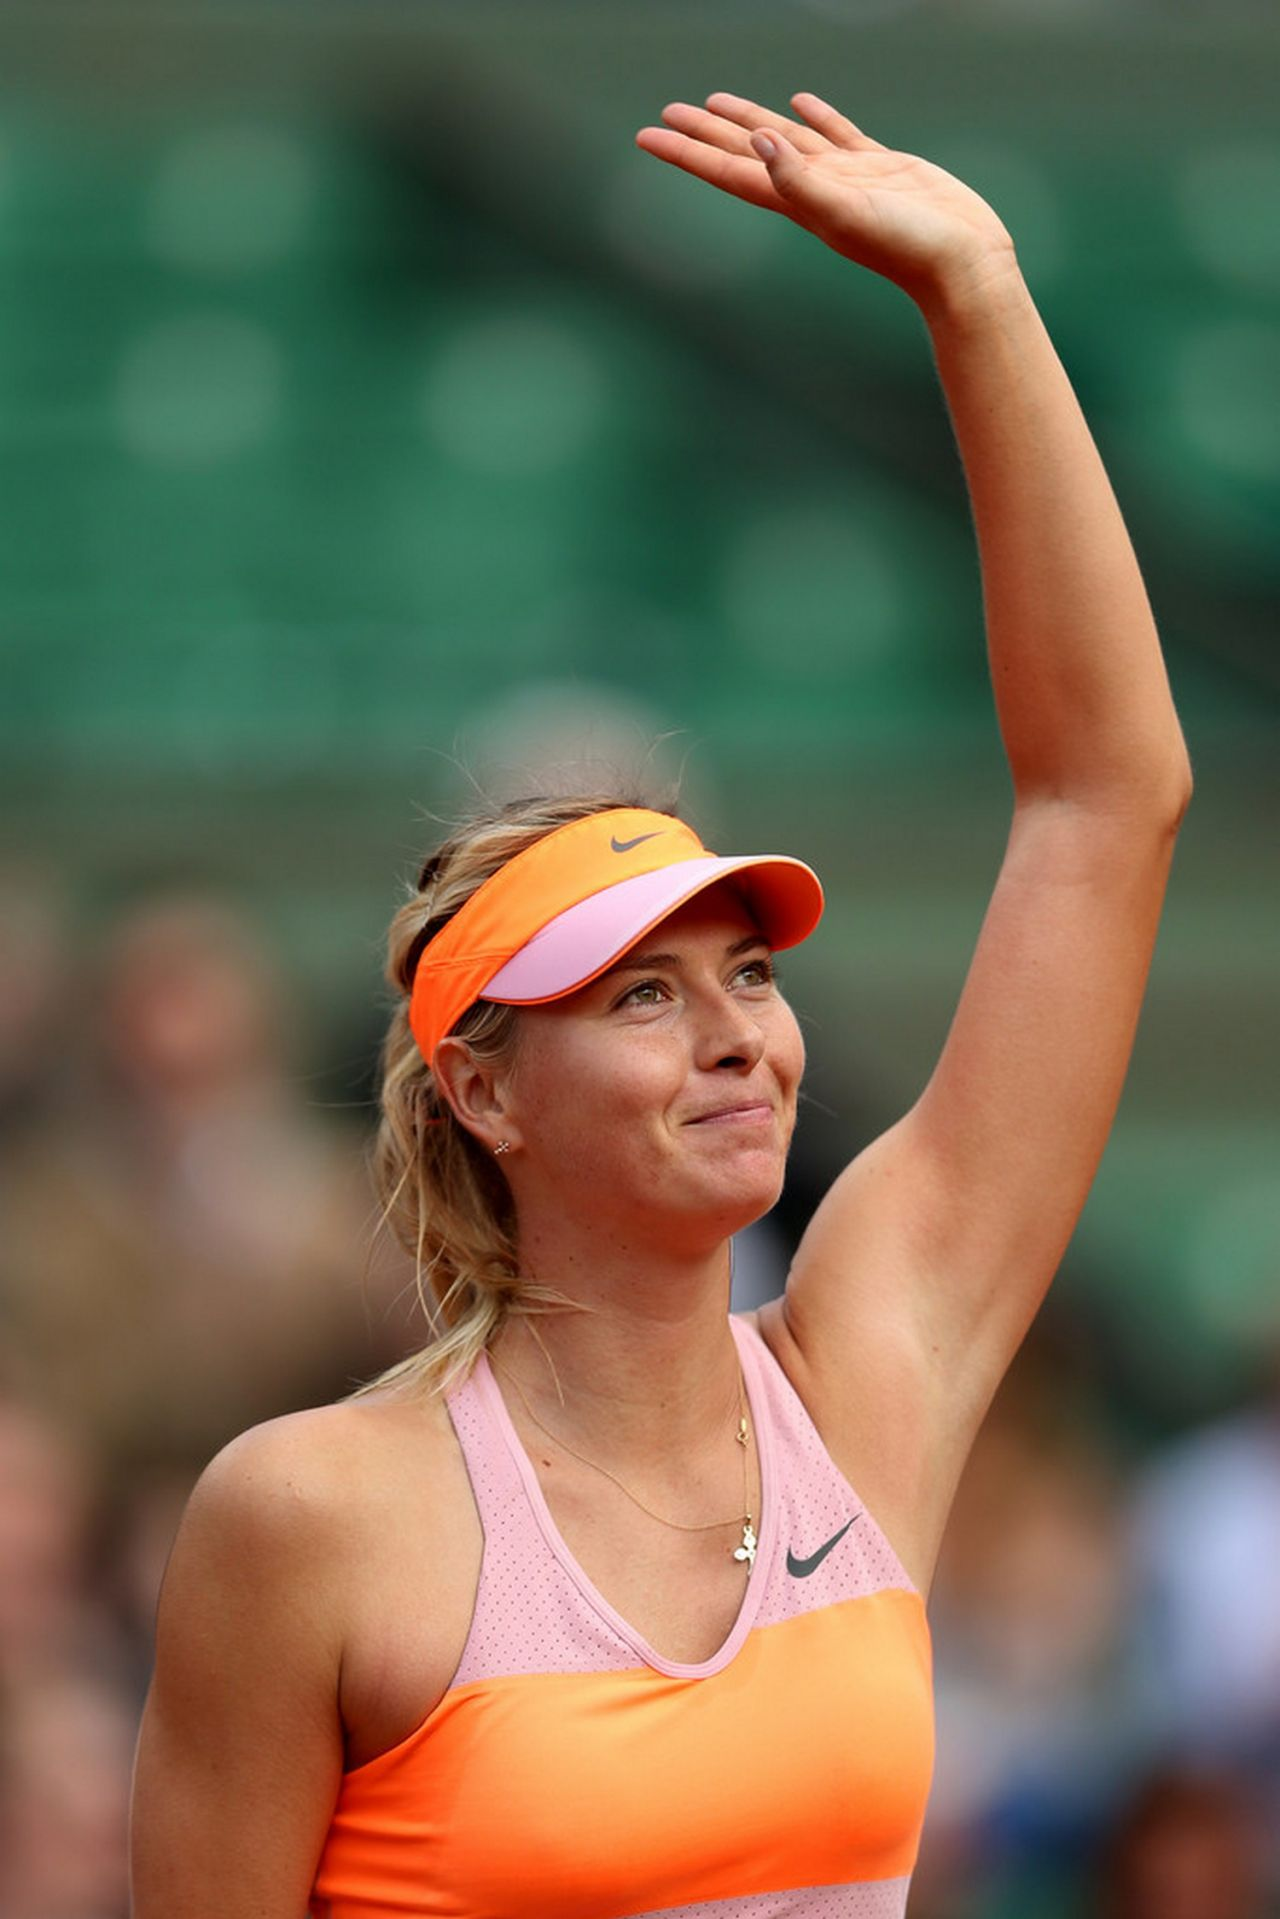 Maria Sharapova 2014 French Open At Roland Garros 3rd Round